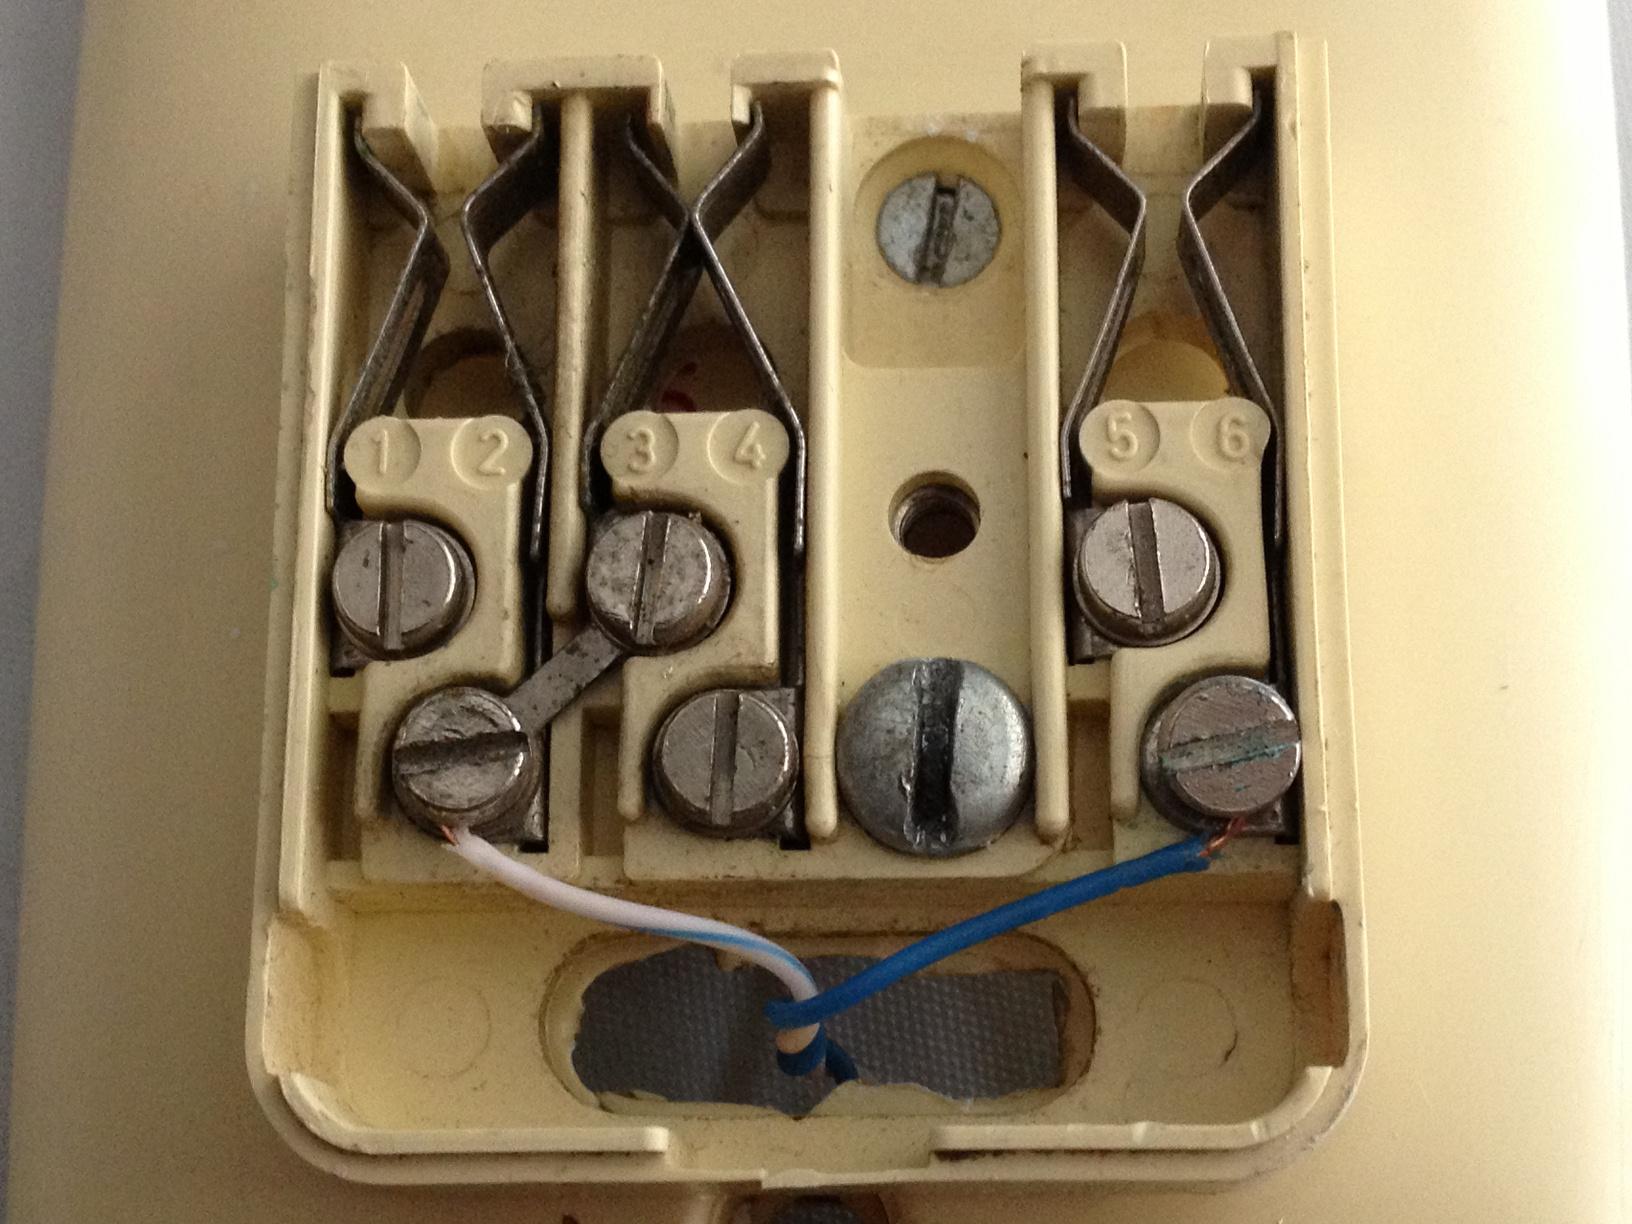 Wiring Phone Jack Australia - Go Wiring Diagrams on